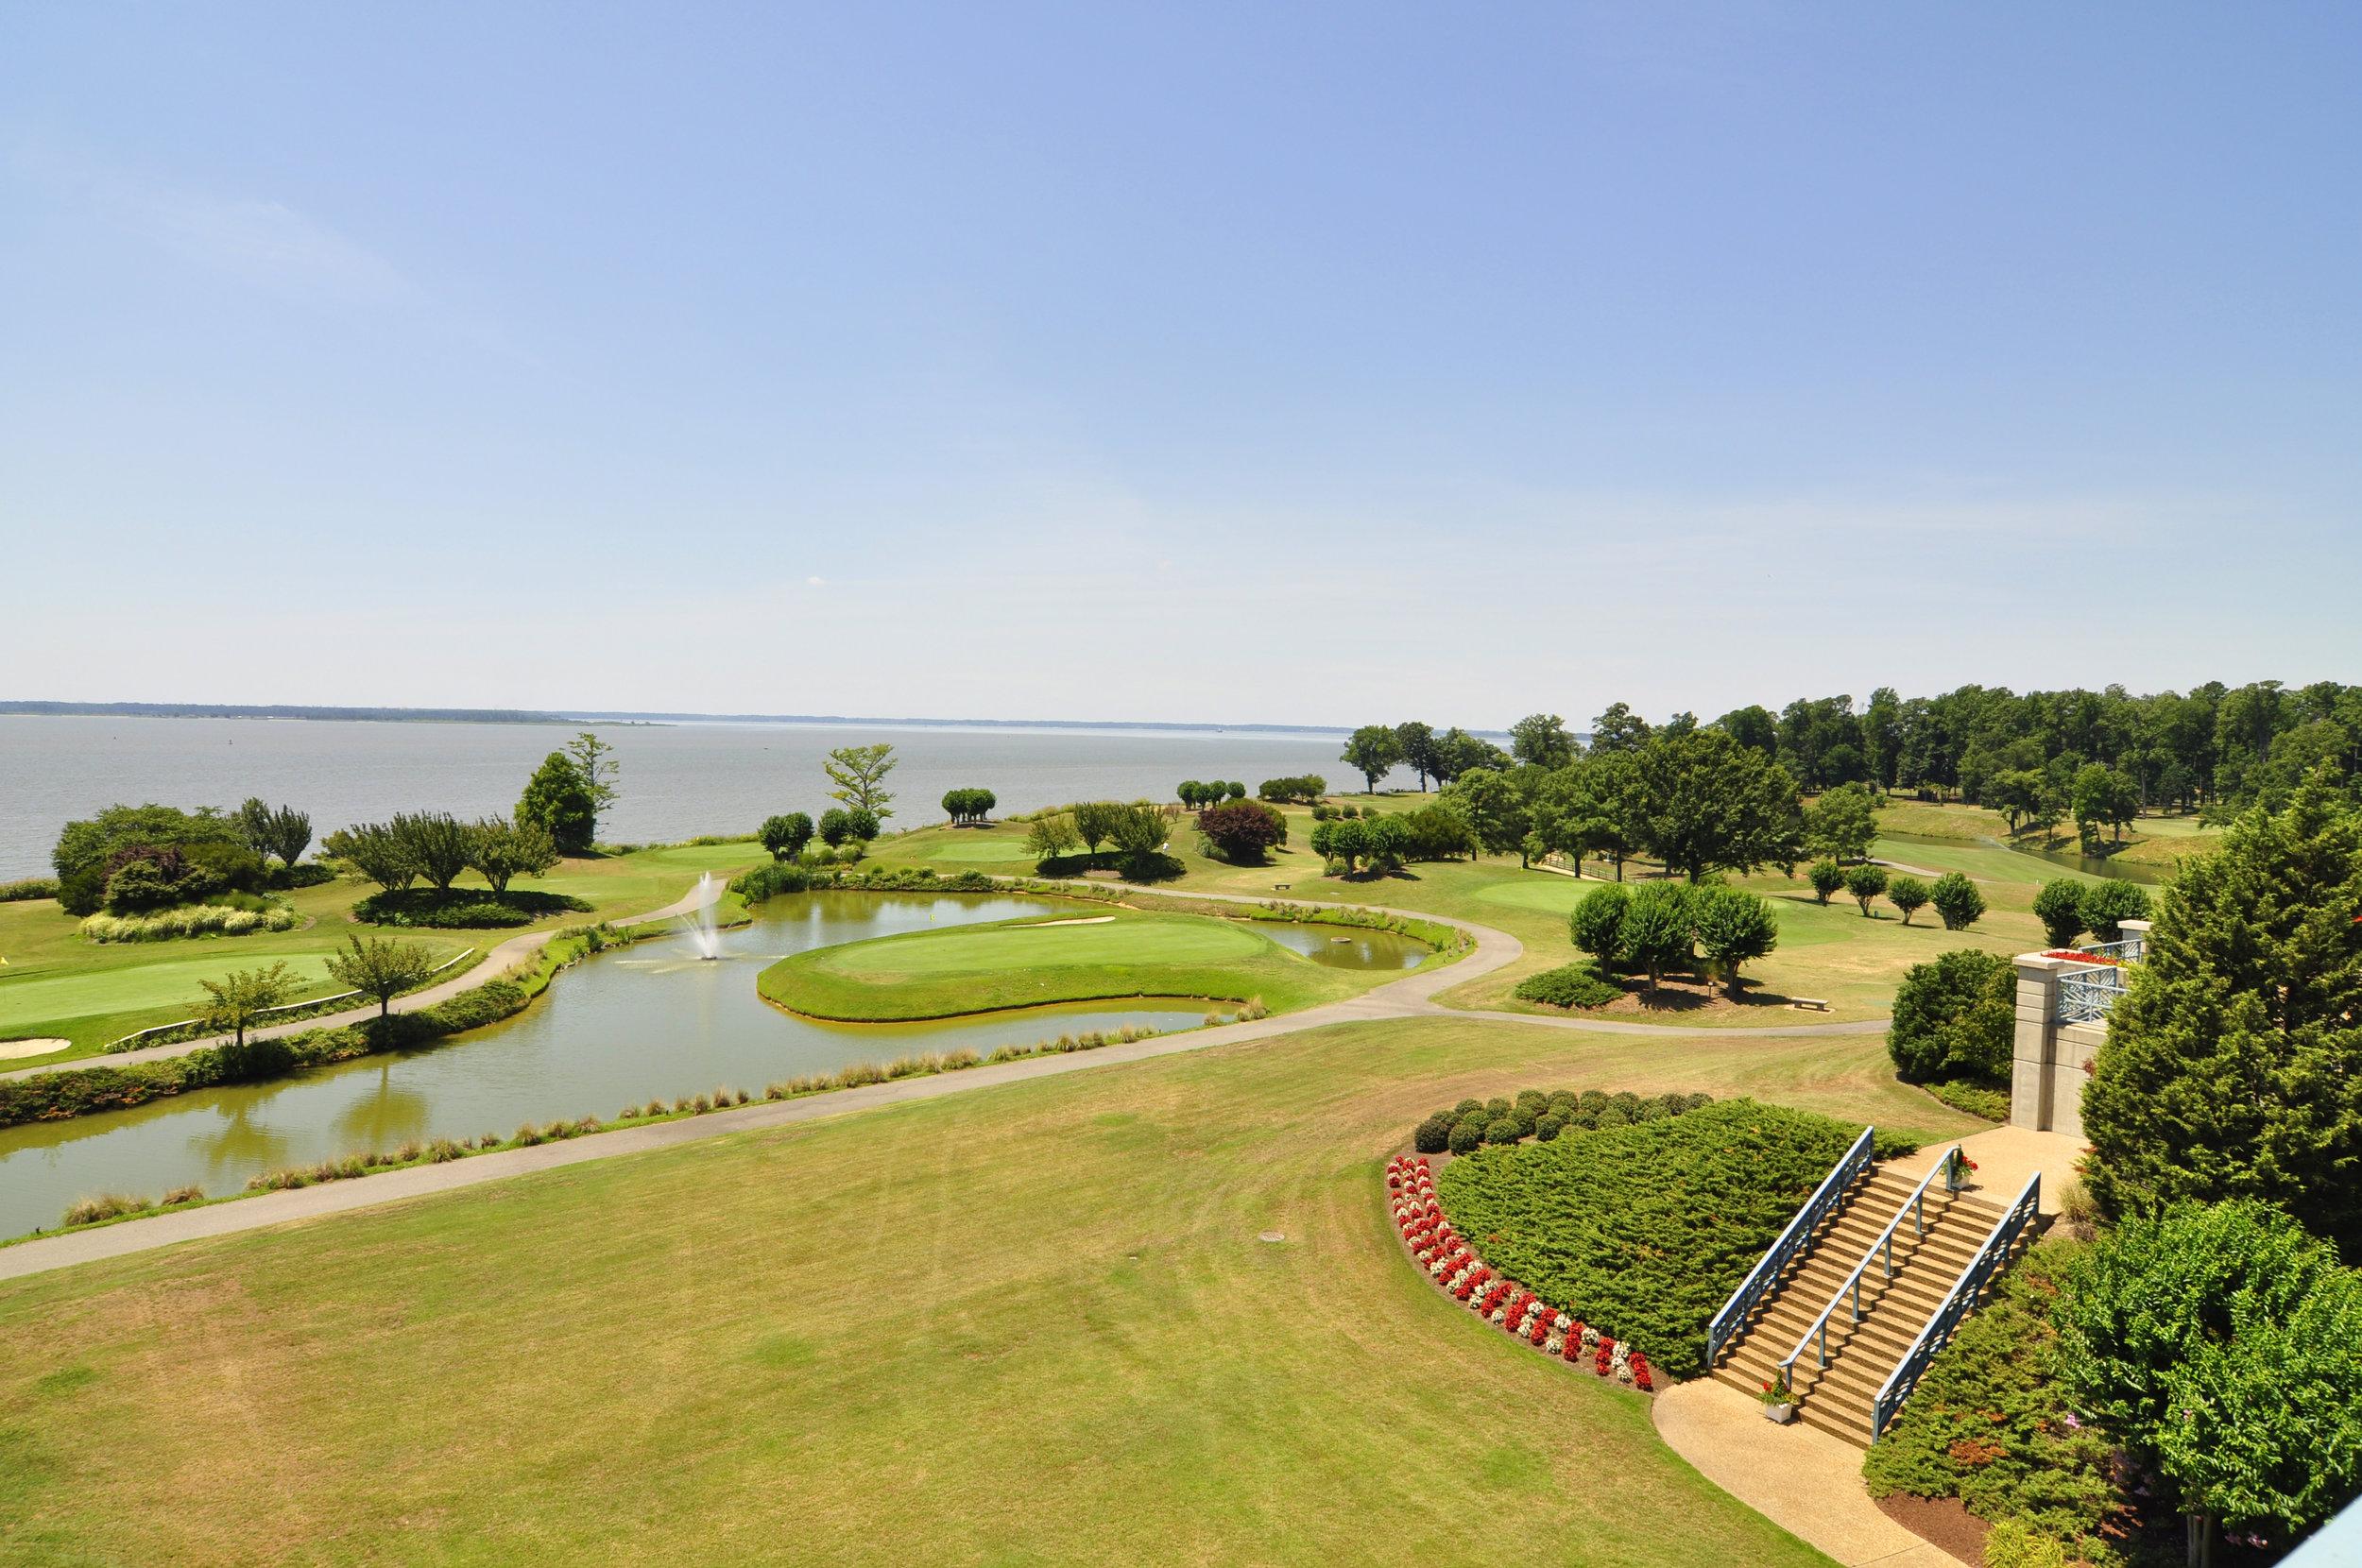 KM golf from deck - Copy.jpg